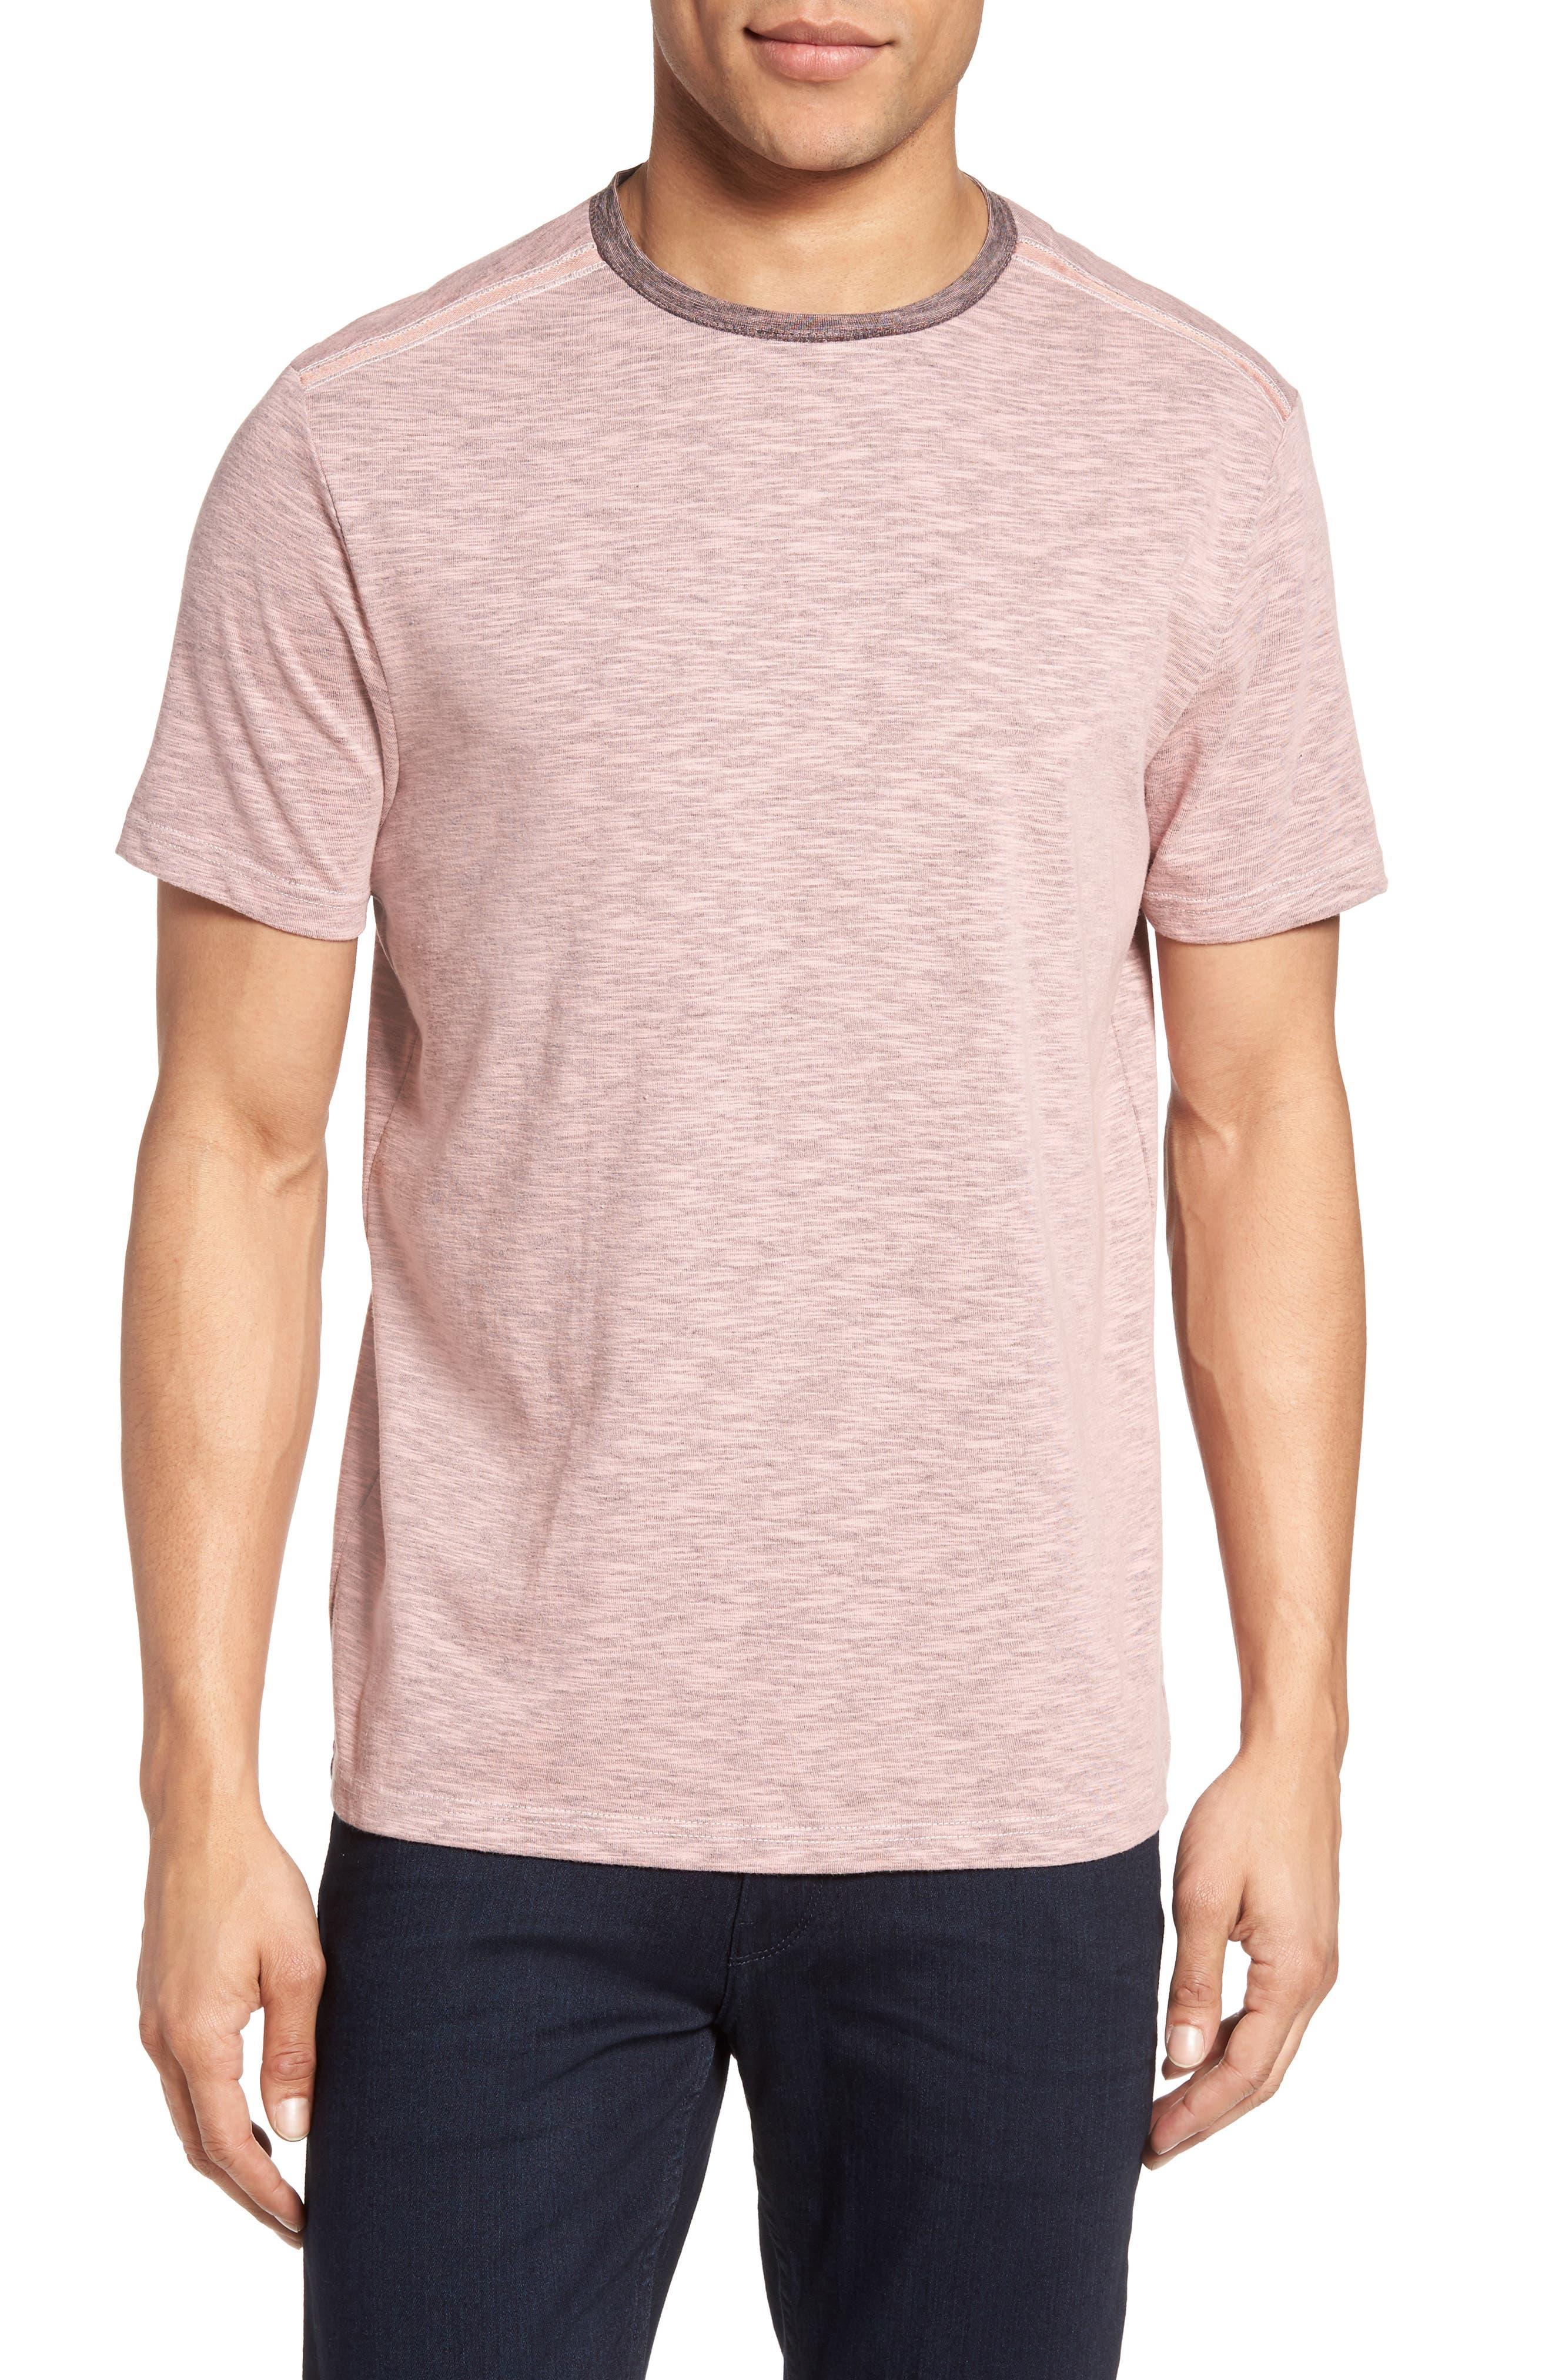 Main Image - Vince Camuto Ringer T-Shirt